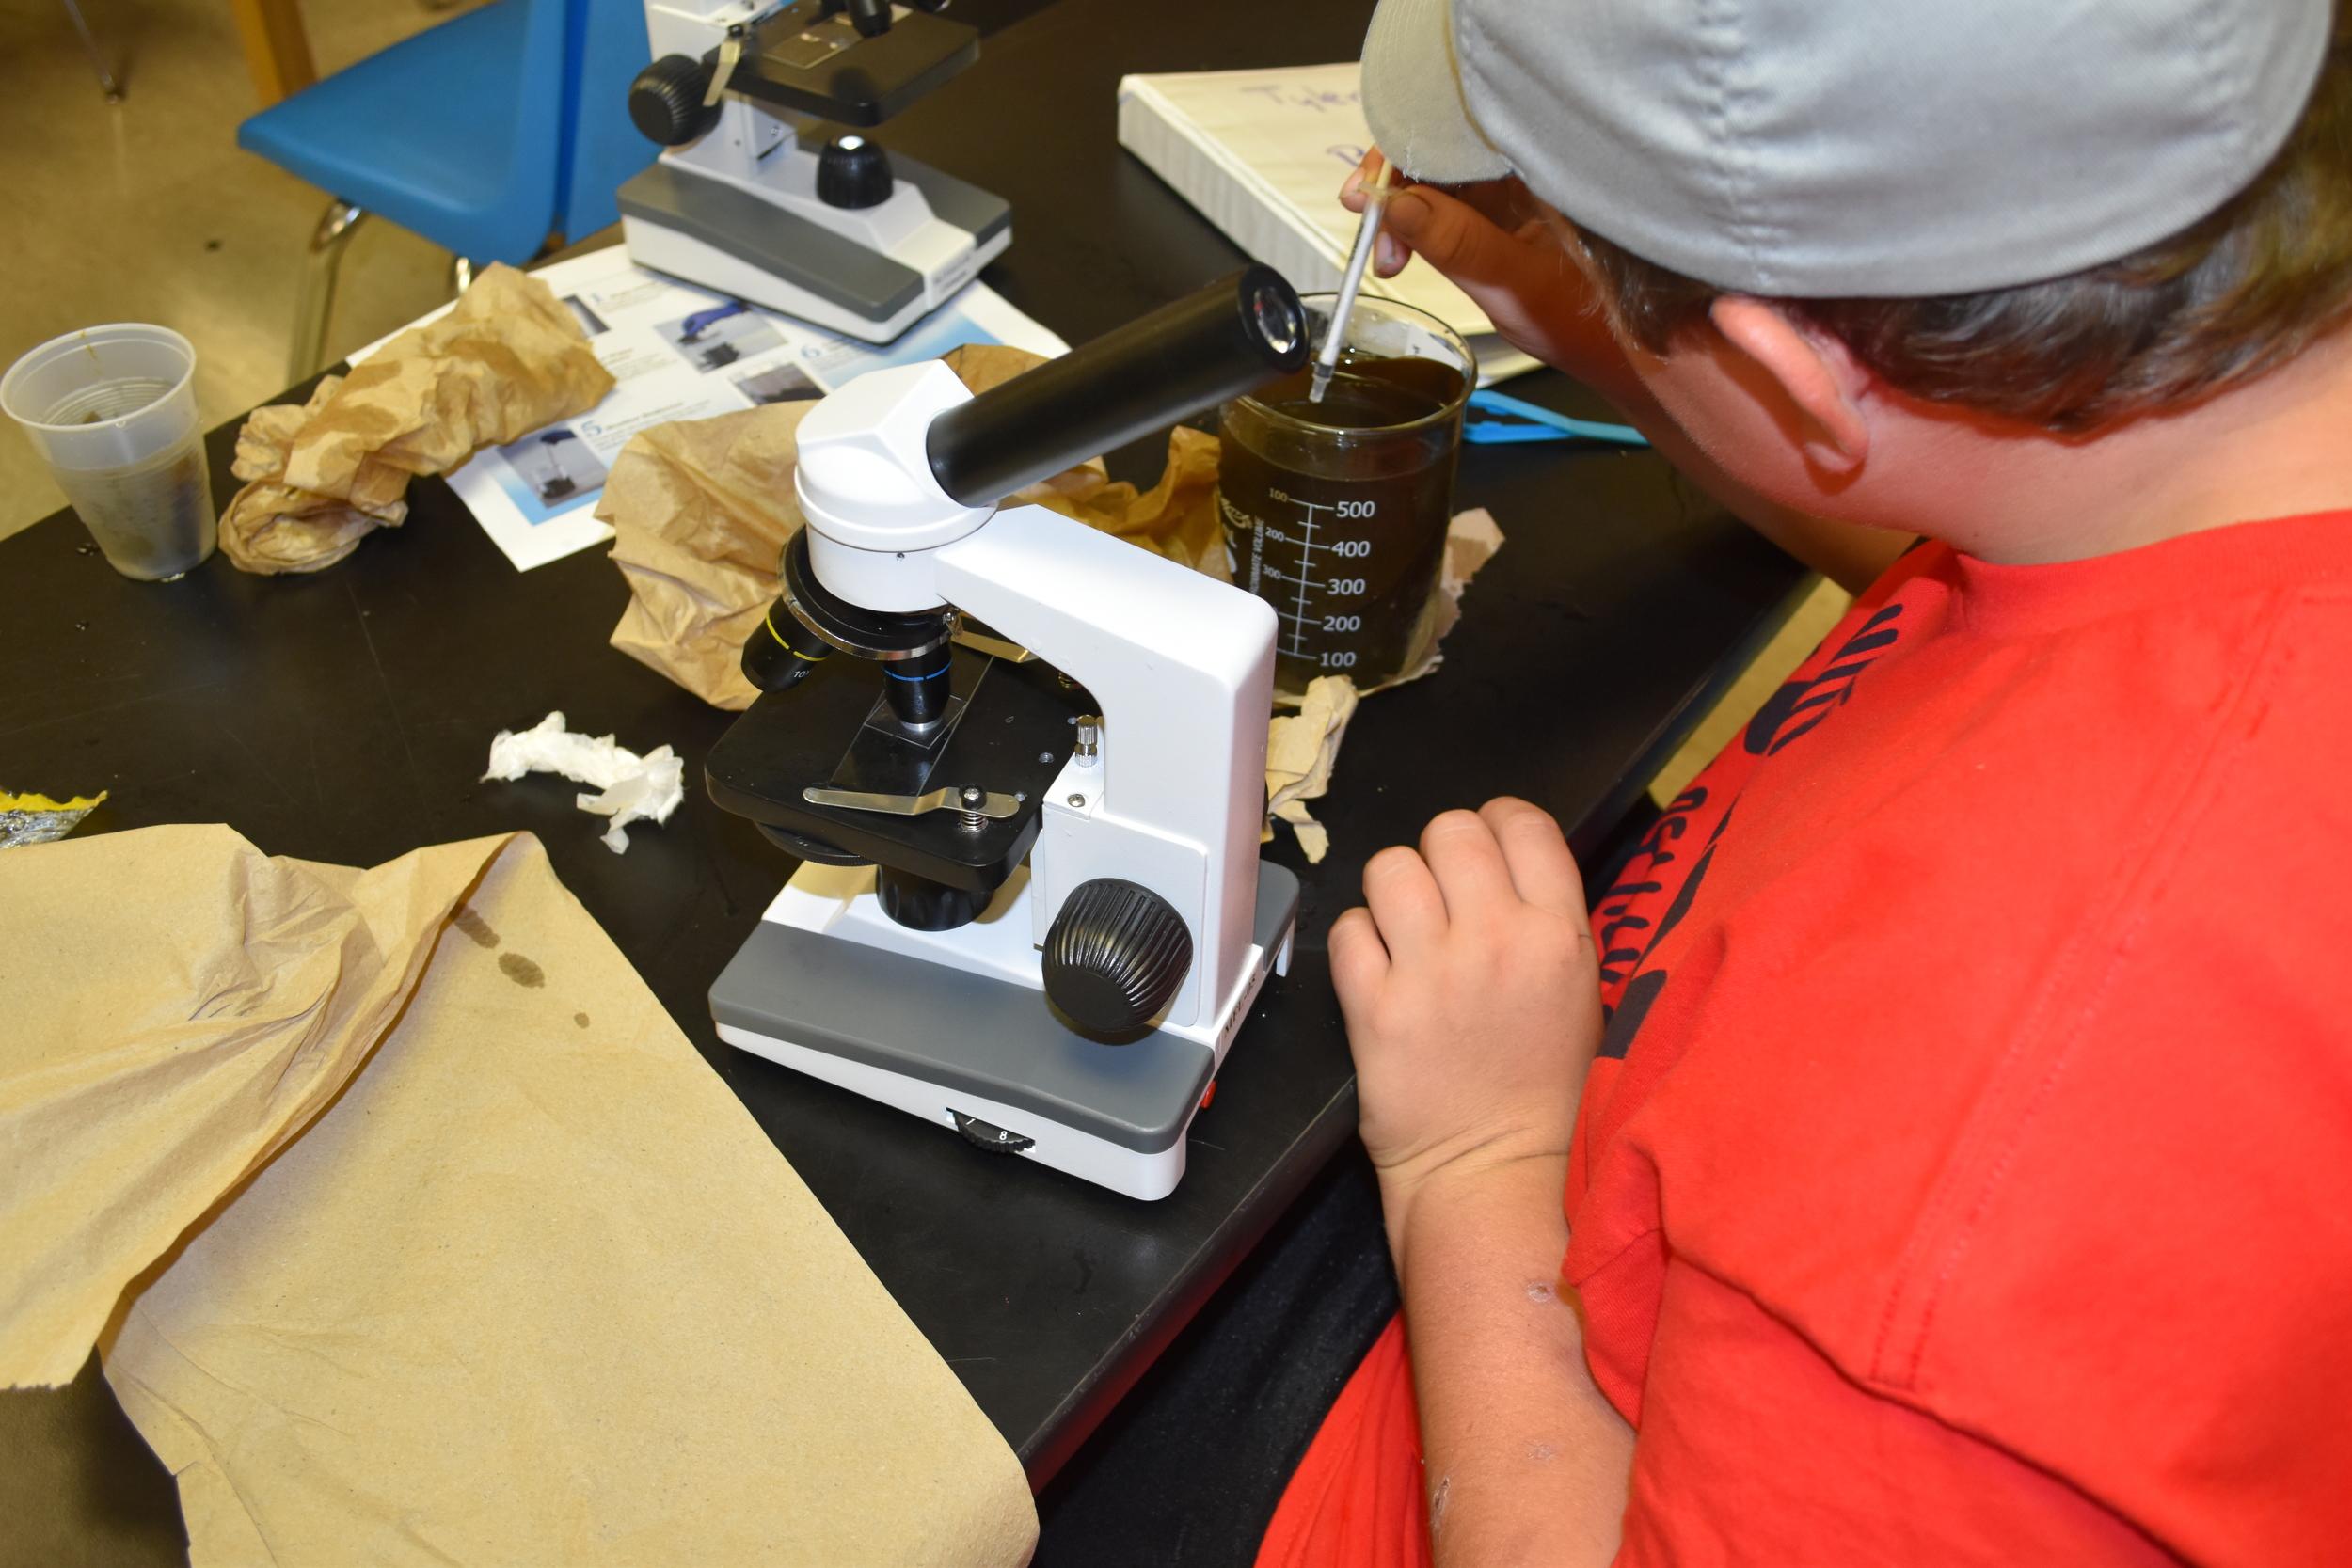 Students harvesting kelp spores